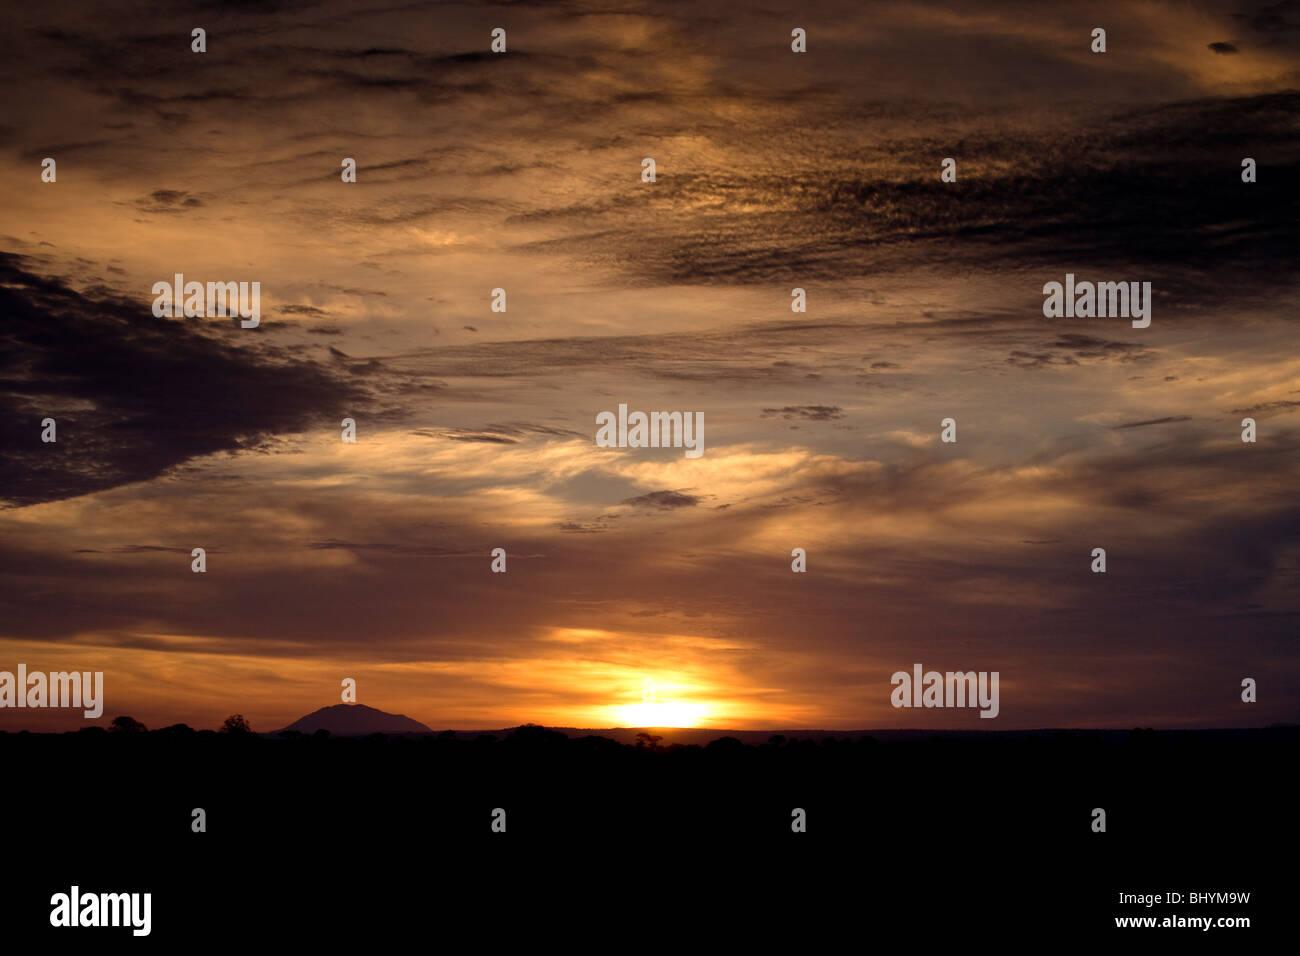 Sunrise at Tarangire NP, Tanzania, East Africa - Stock Image